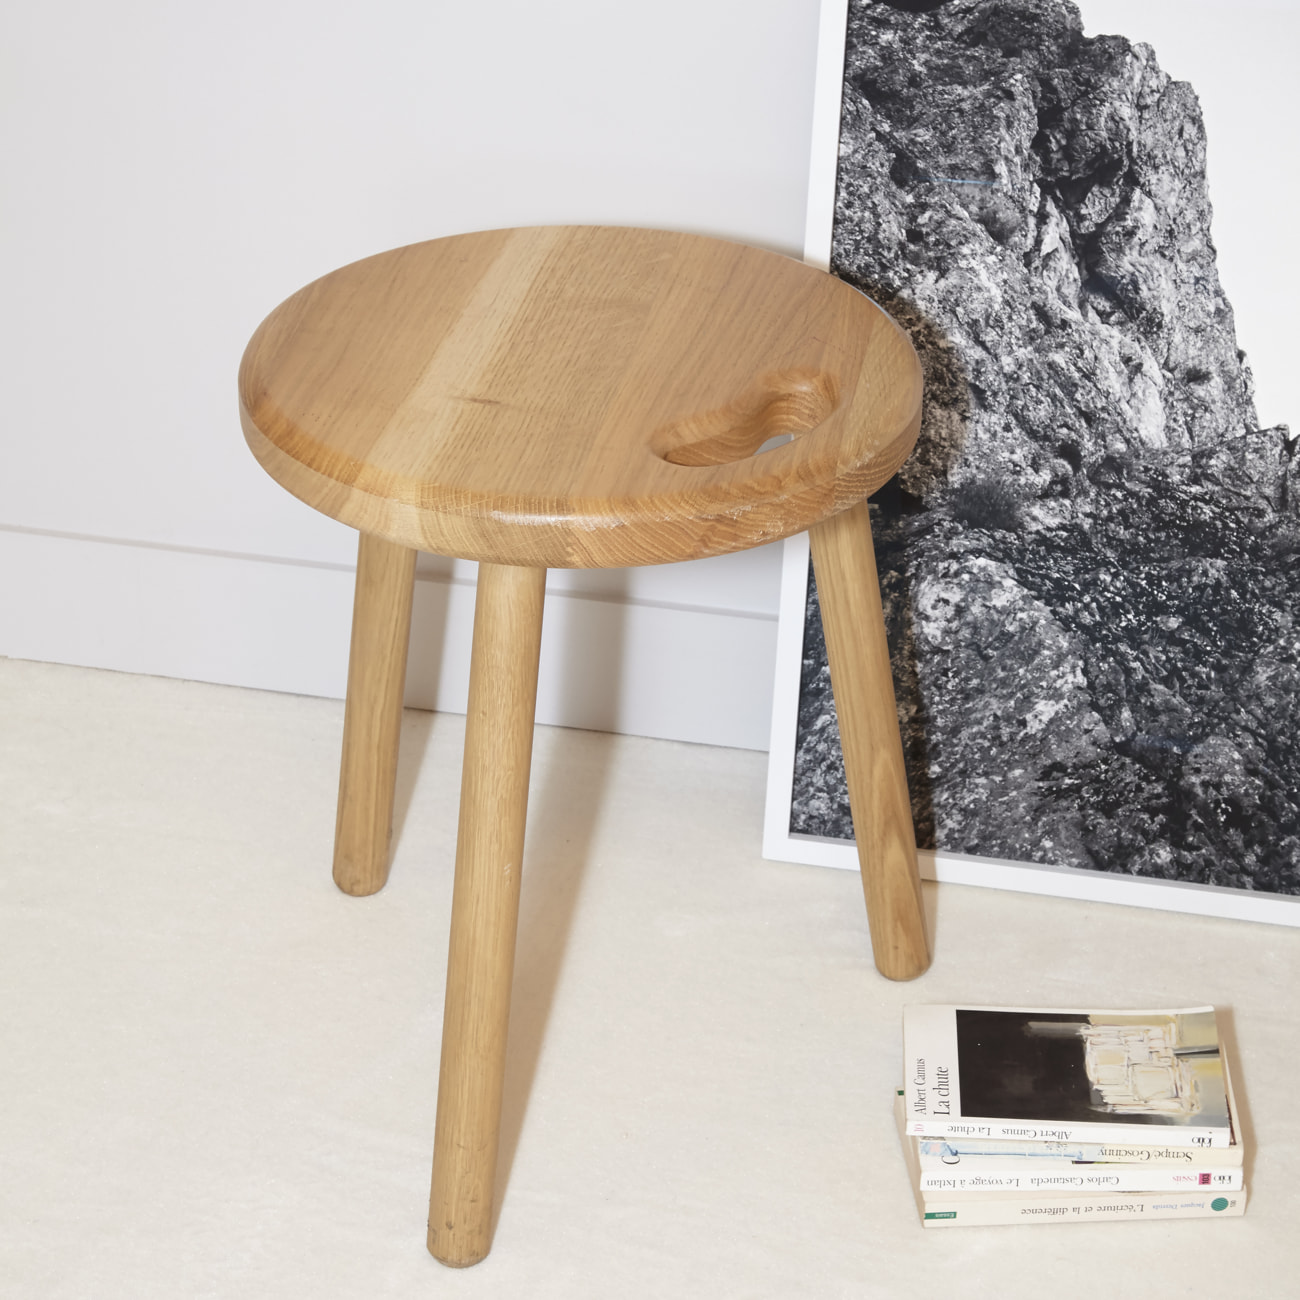 furniture-remix-barstool-the-hansen-family-1